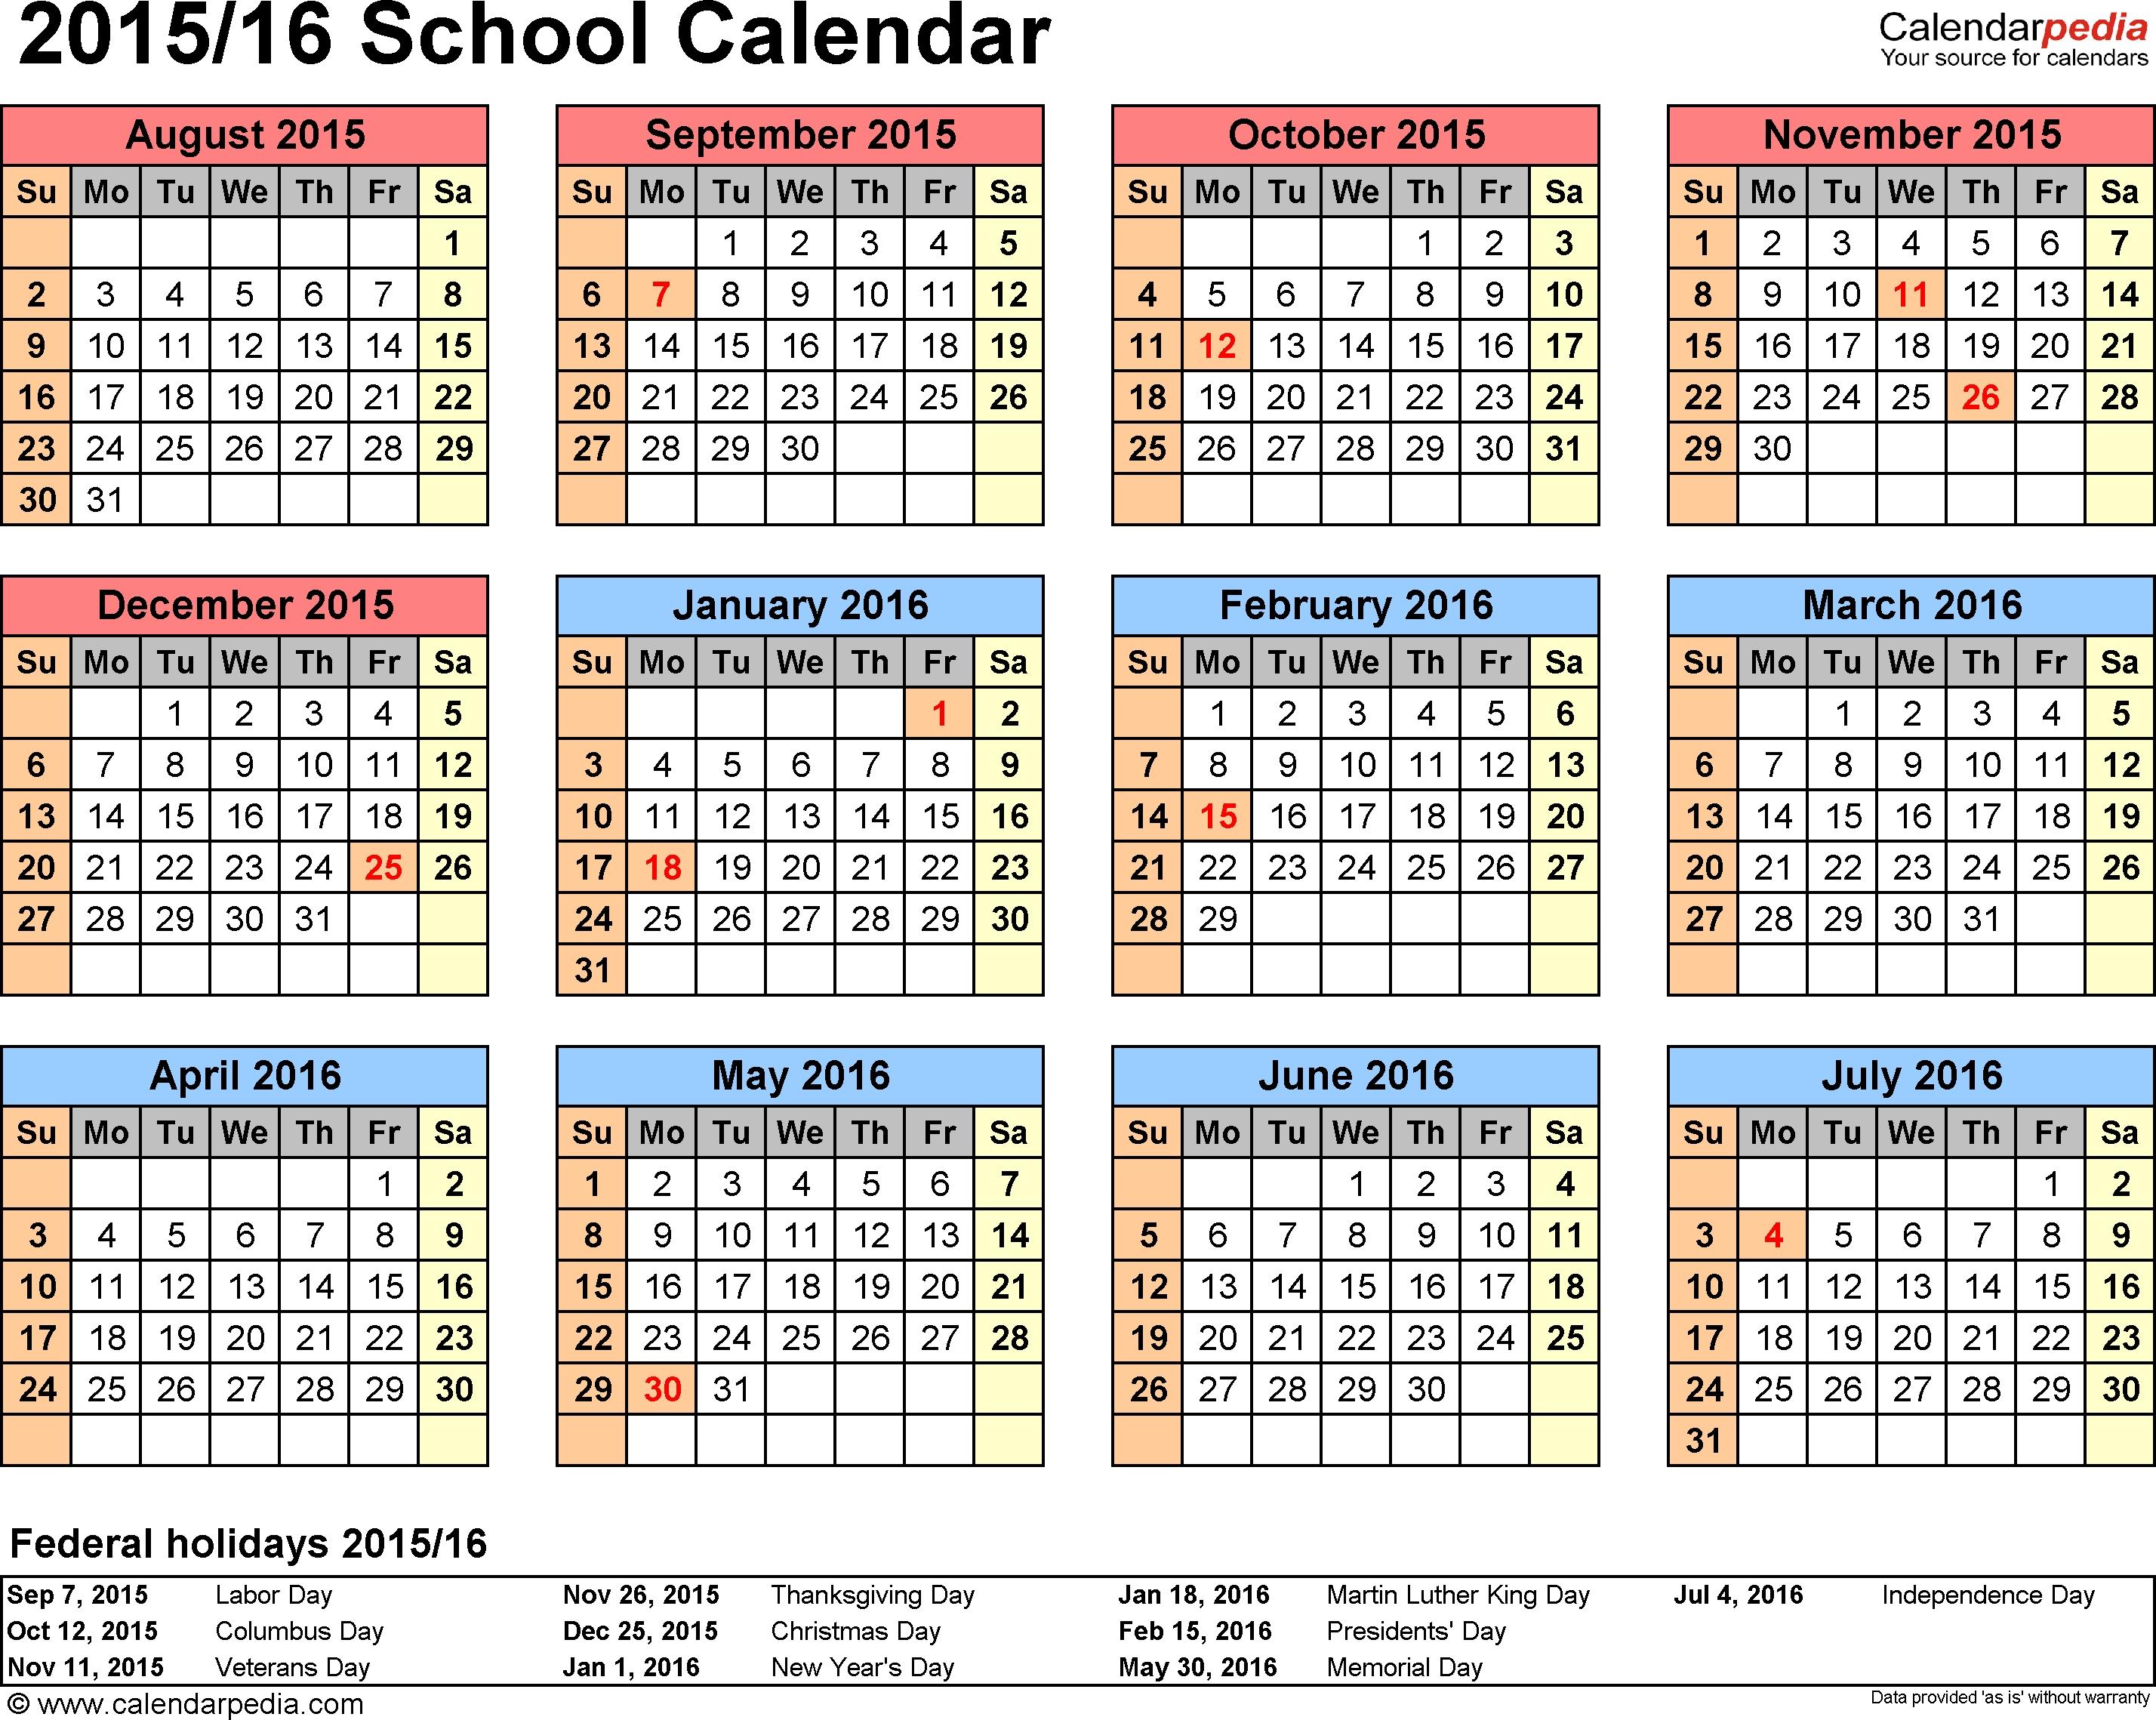 School Calendars 2015/2016 As Free Printable Word Templates Perky Calendar For School Year